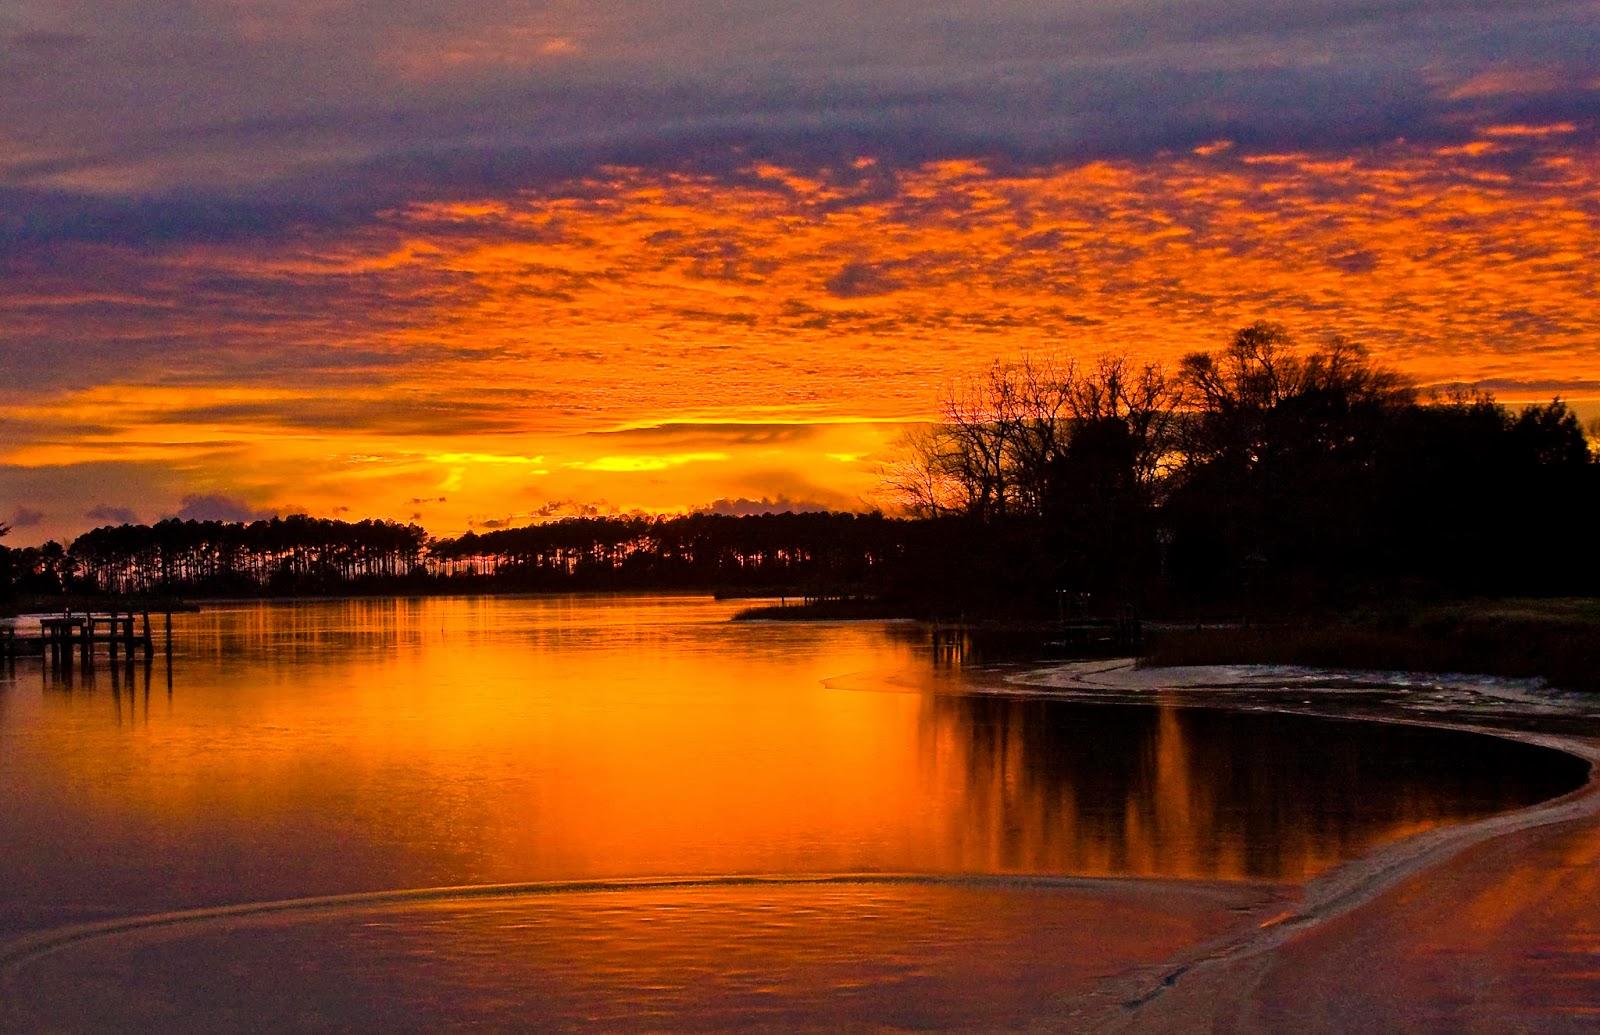 Winter Sunset HD Wallpaper - WallpaperSafari